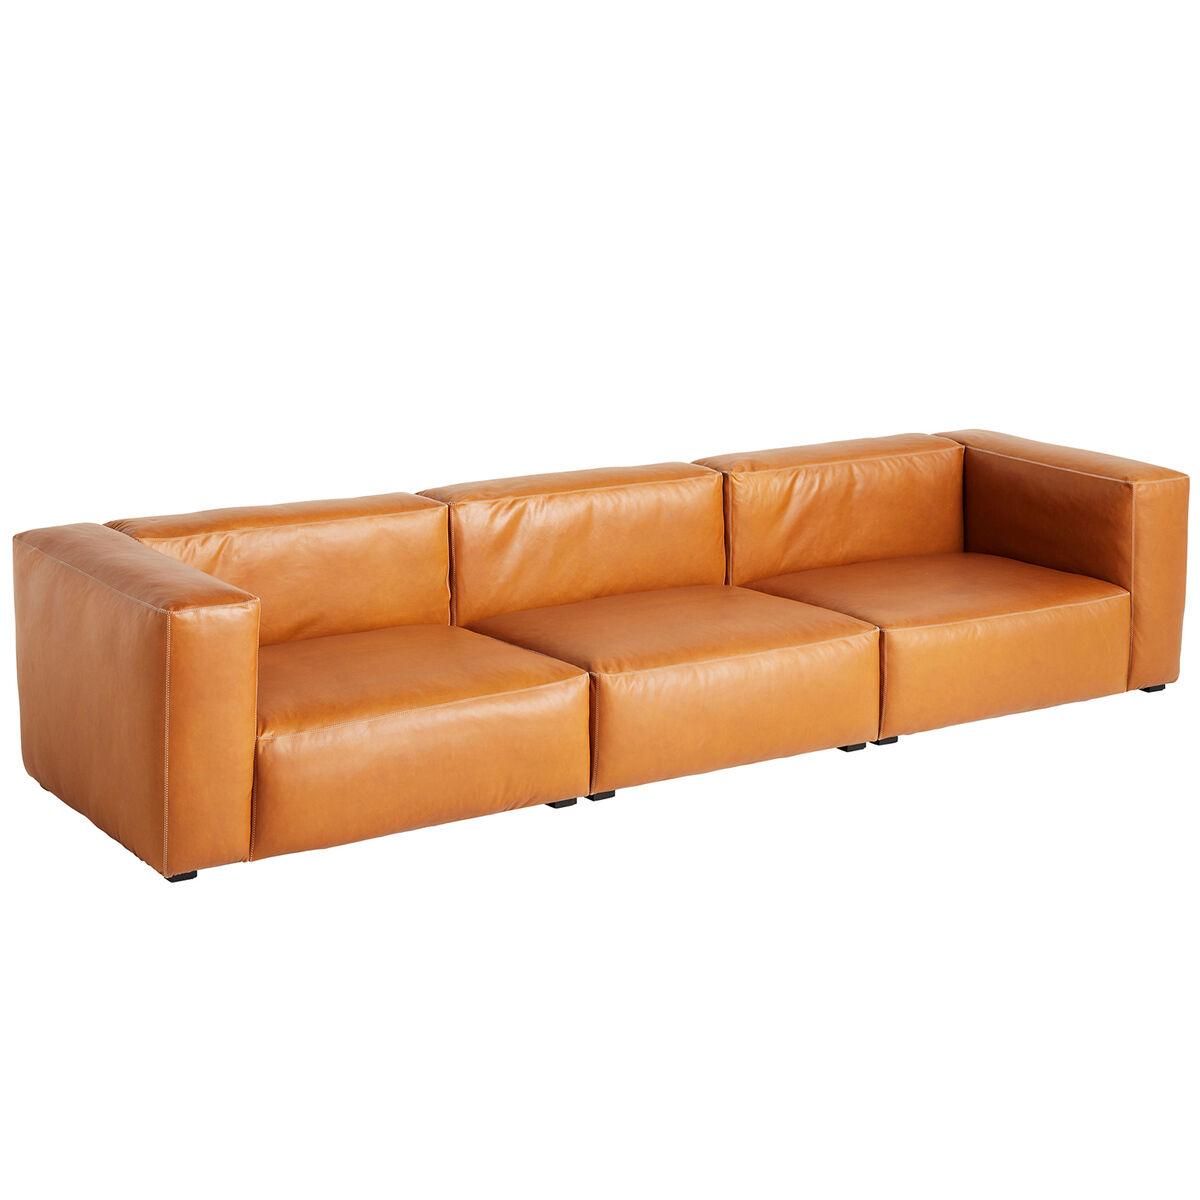 Hay Mags Soft sohva 3-ist/319,5 cm, korkea k�sinoja, Silk 0250